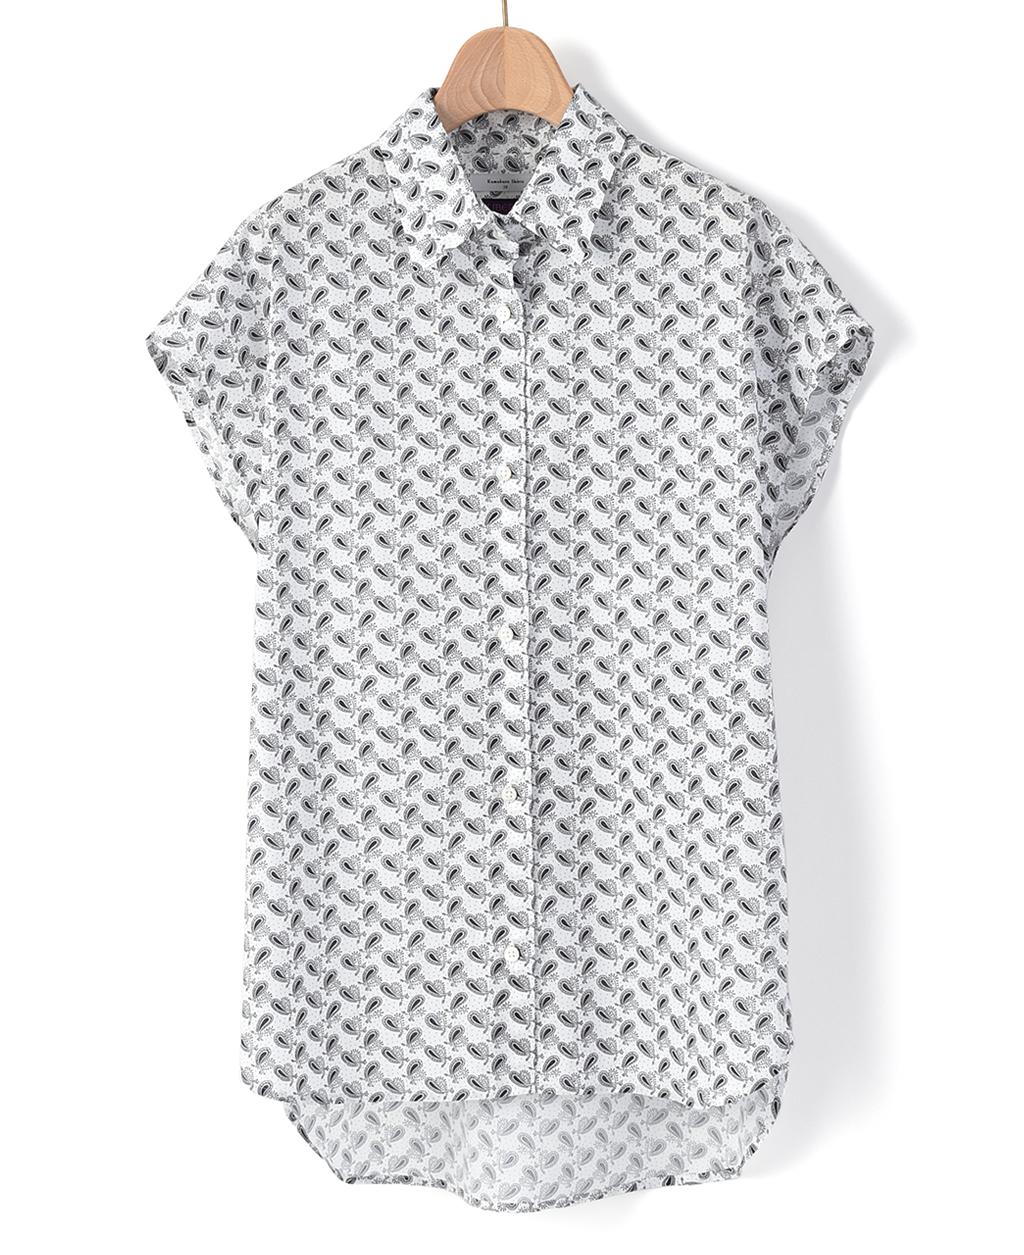 f574bd95554ea6 カジュアルシャツ(36サイズ / 7号 白): レディース | メーカーズシャツ ...